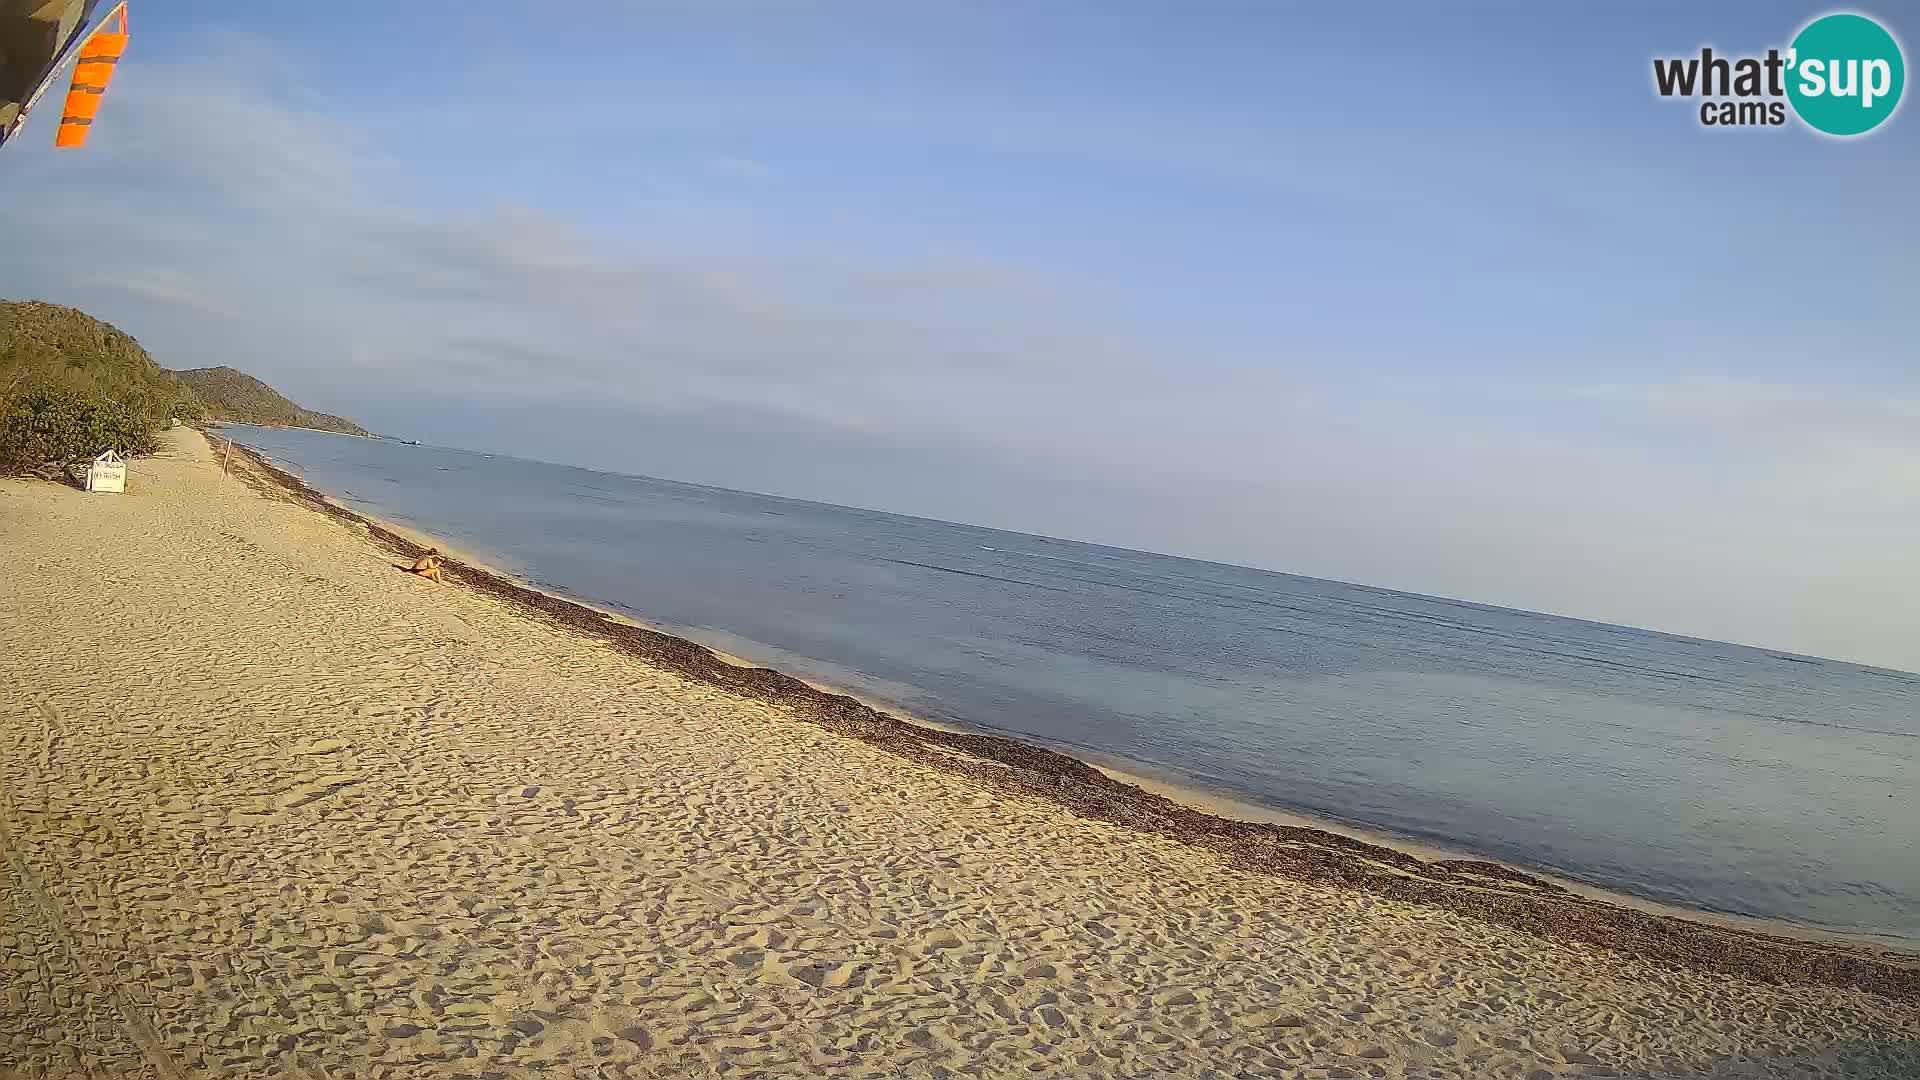 Webcam Strand Buen Hombre – Kite School